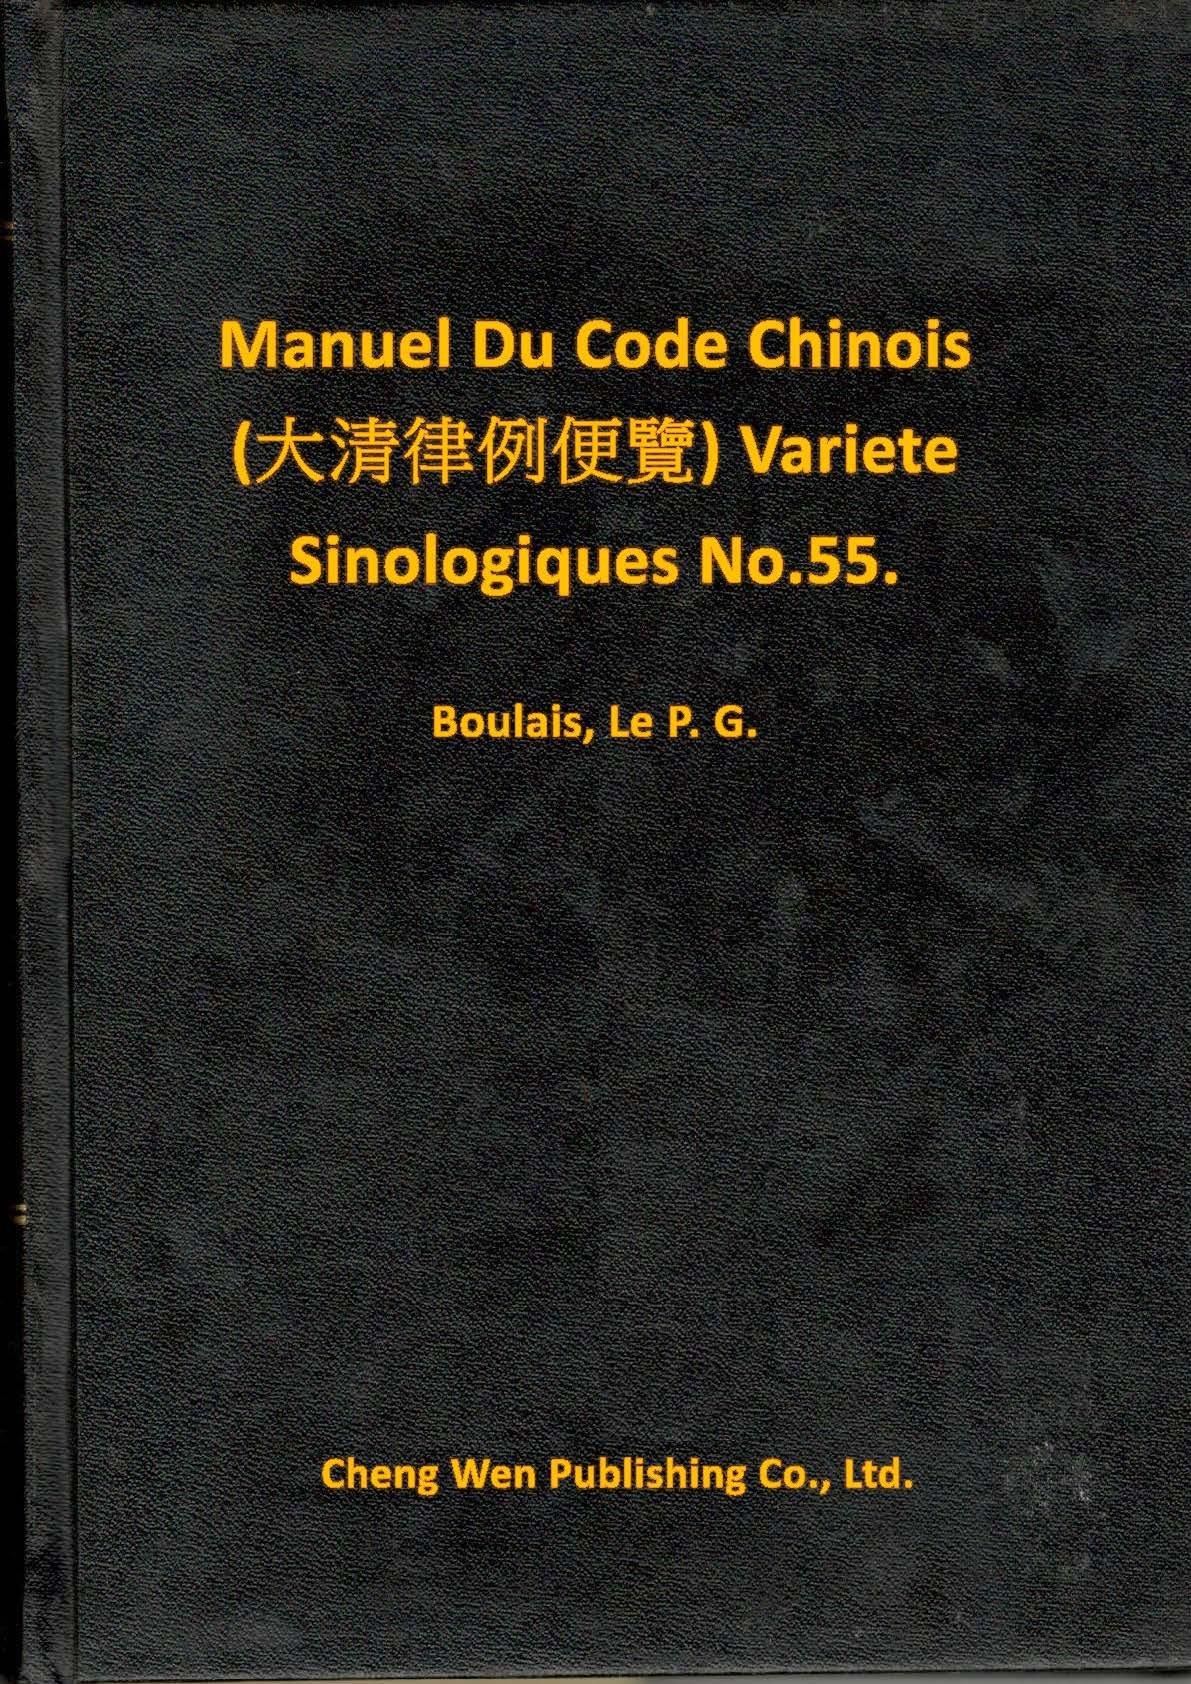 Manuel du code chinois variete sinologiques no55 manuel du code chinois variete sinologiques no55 le p g boulais amazon books thecheapjerseys Image collections